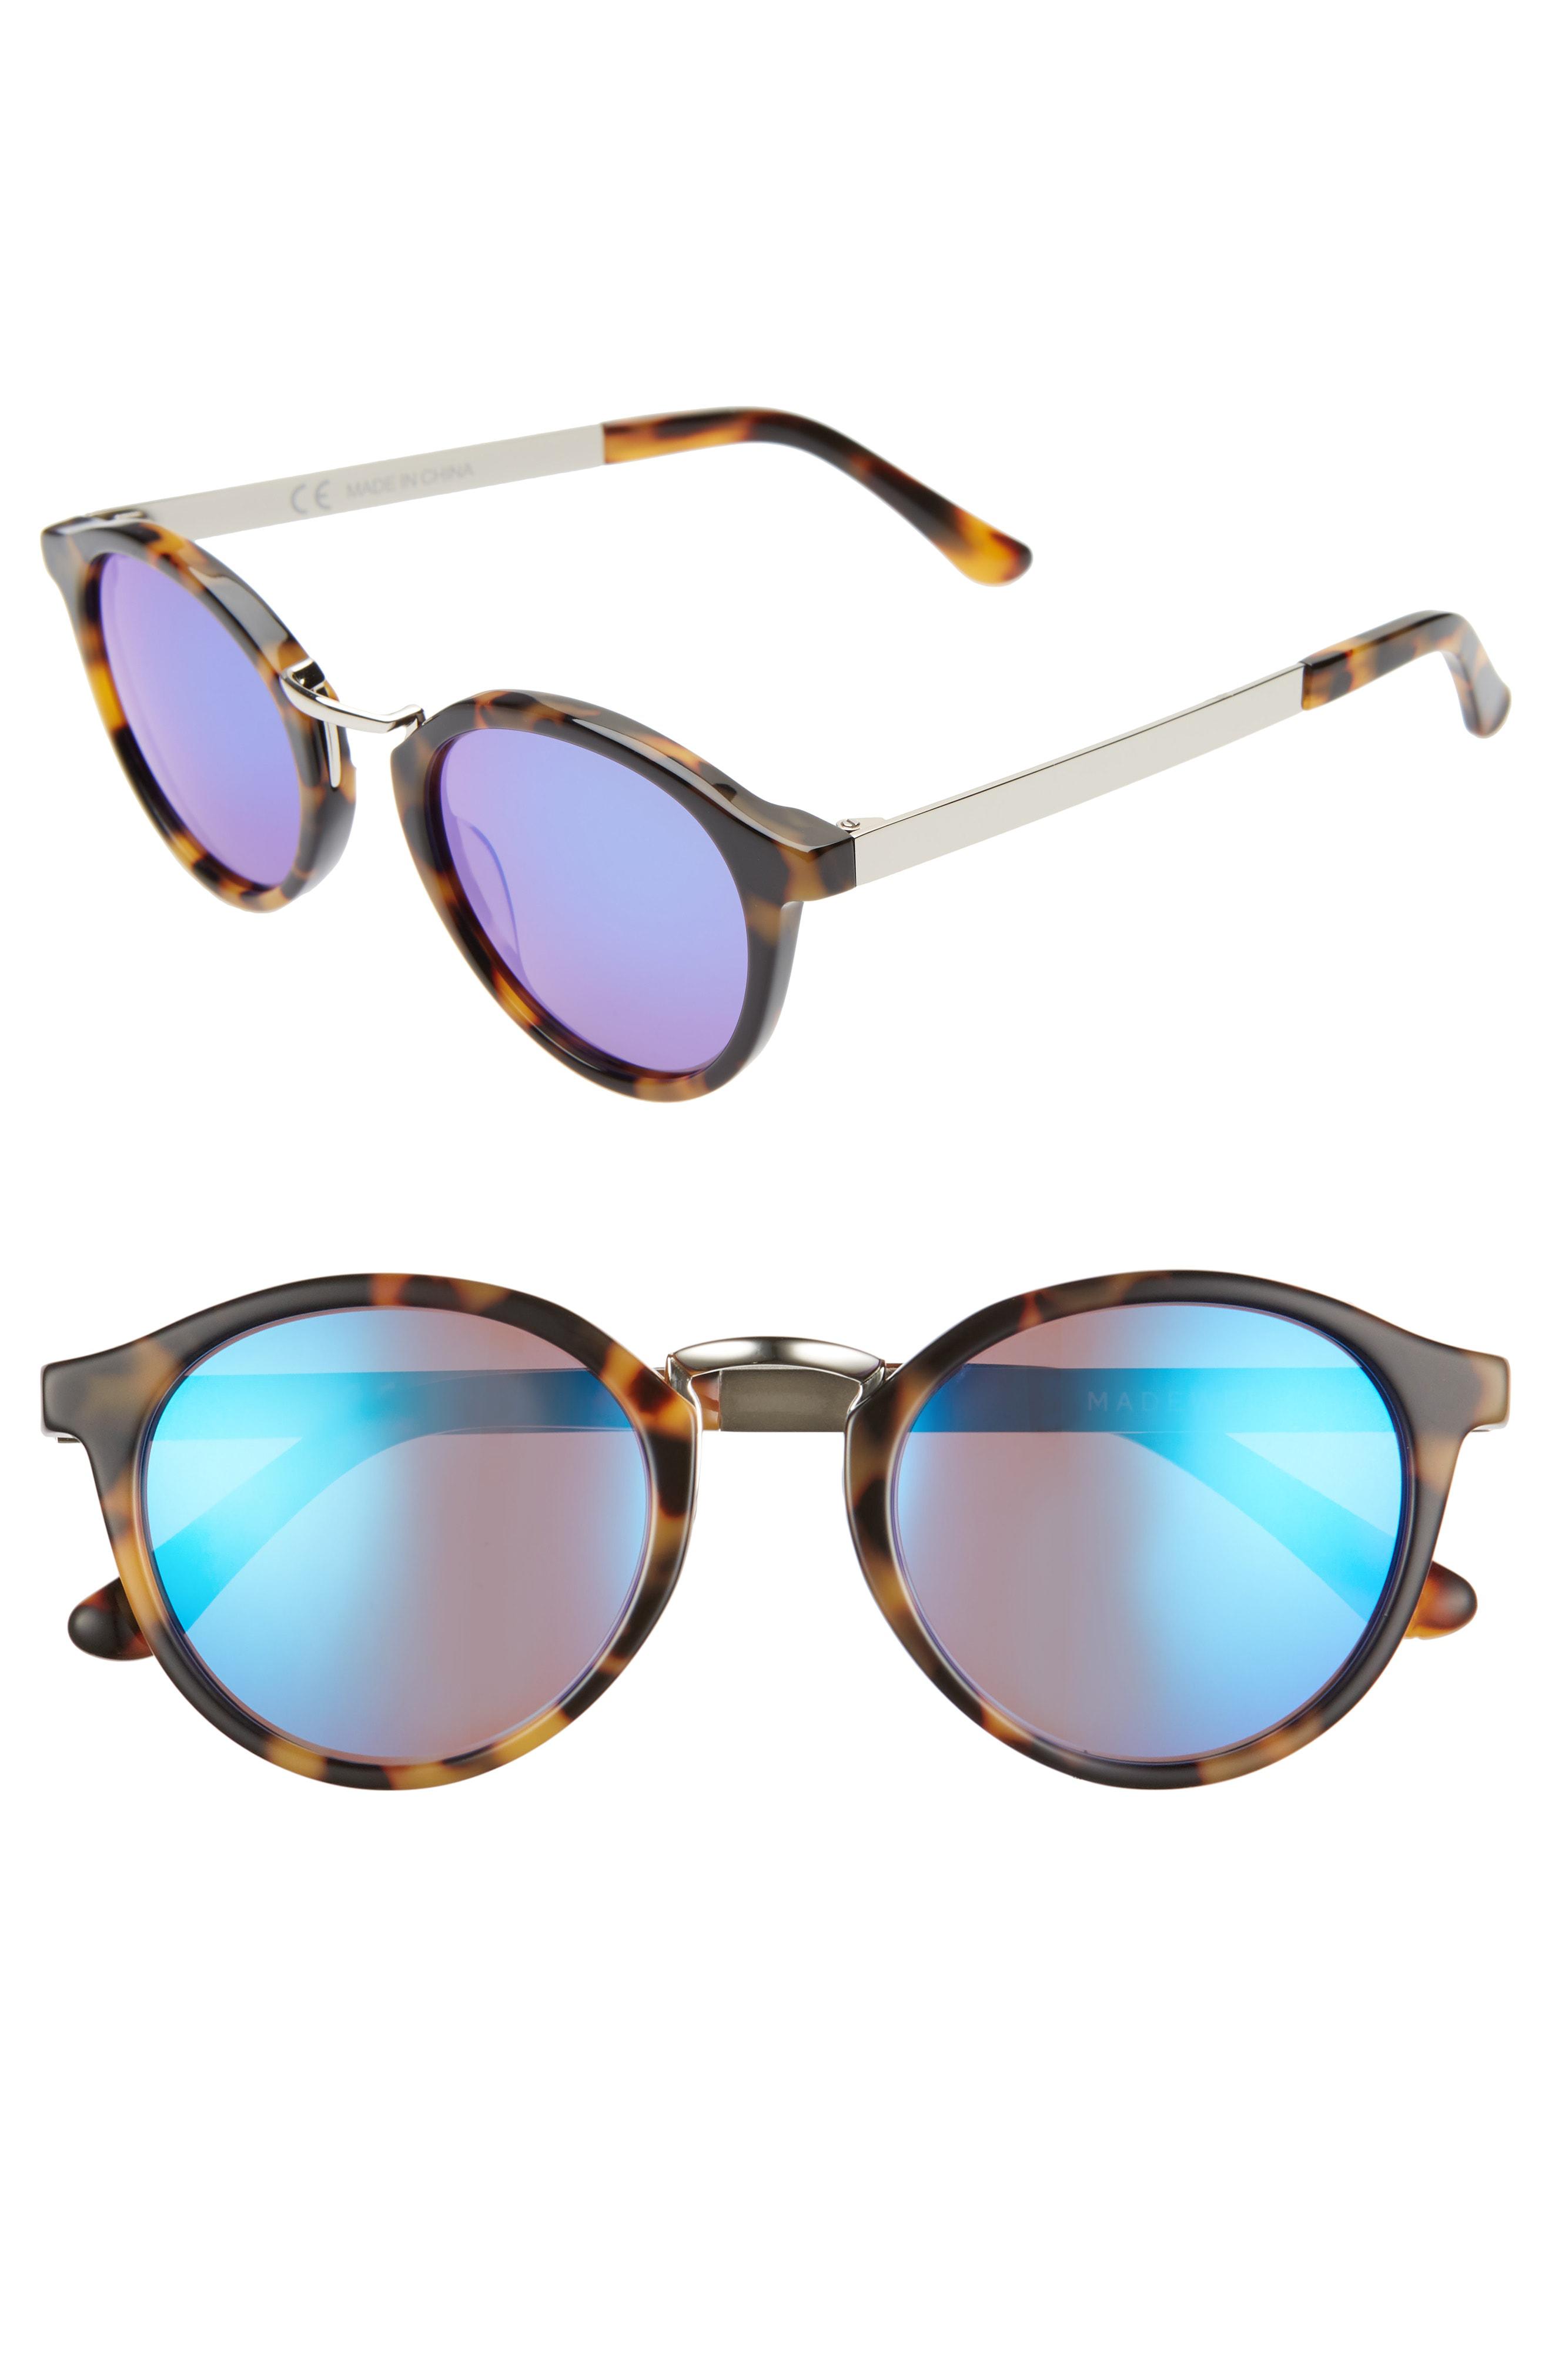 163f5f1af0e13 Madewell Indio 48Mm Round Sunglasses - Demi Tortoise  Flash Blue ...